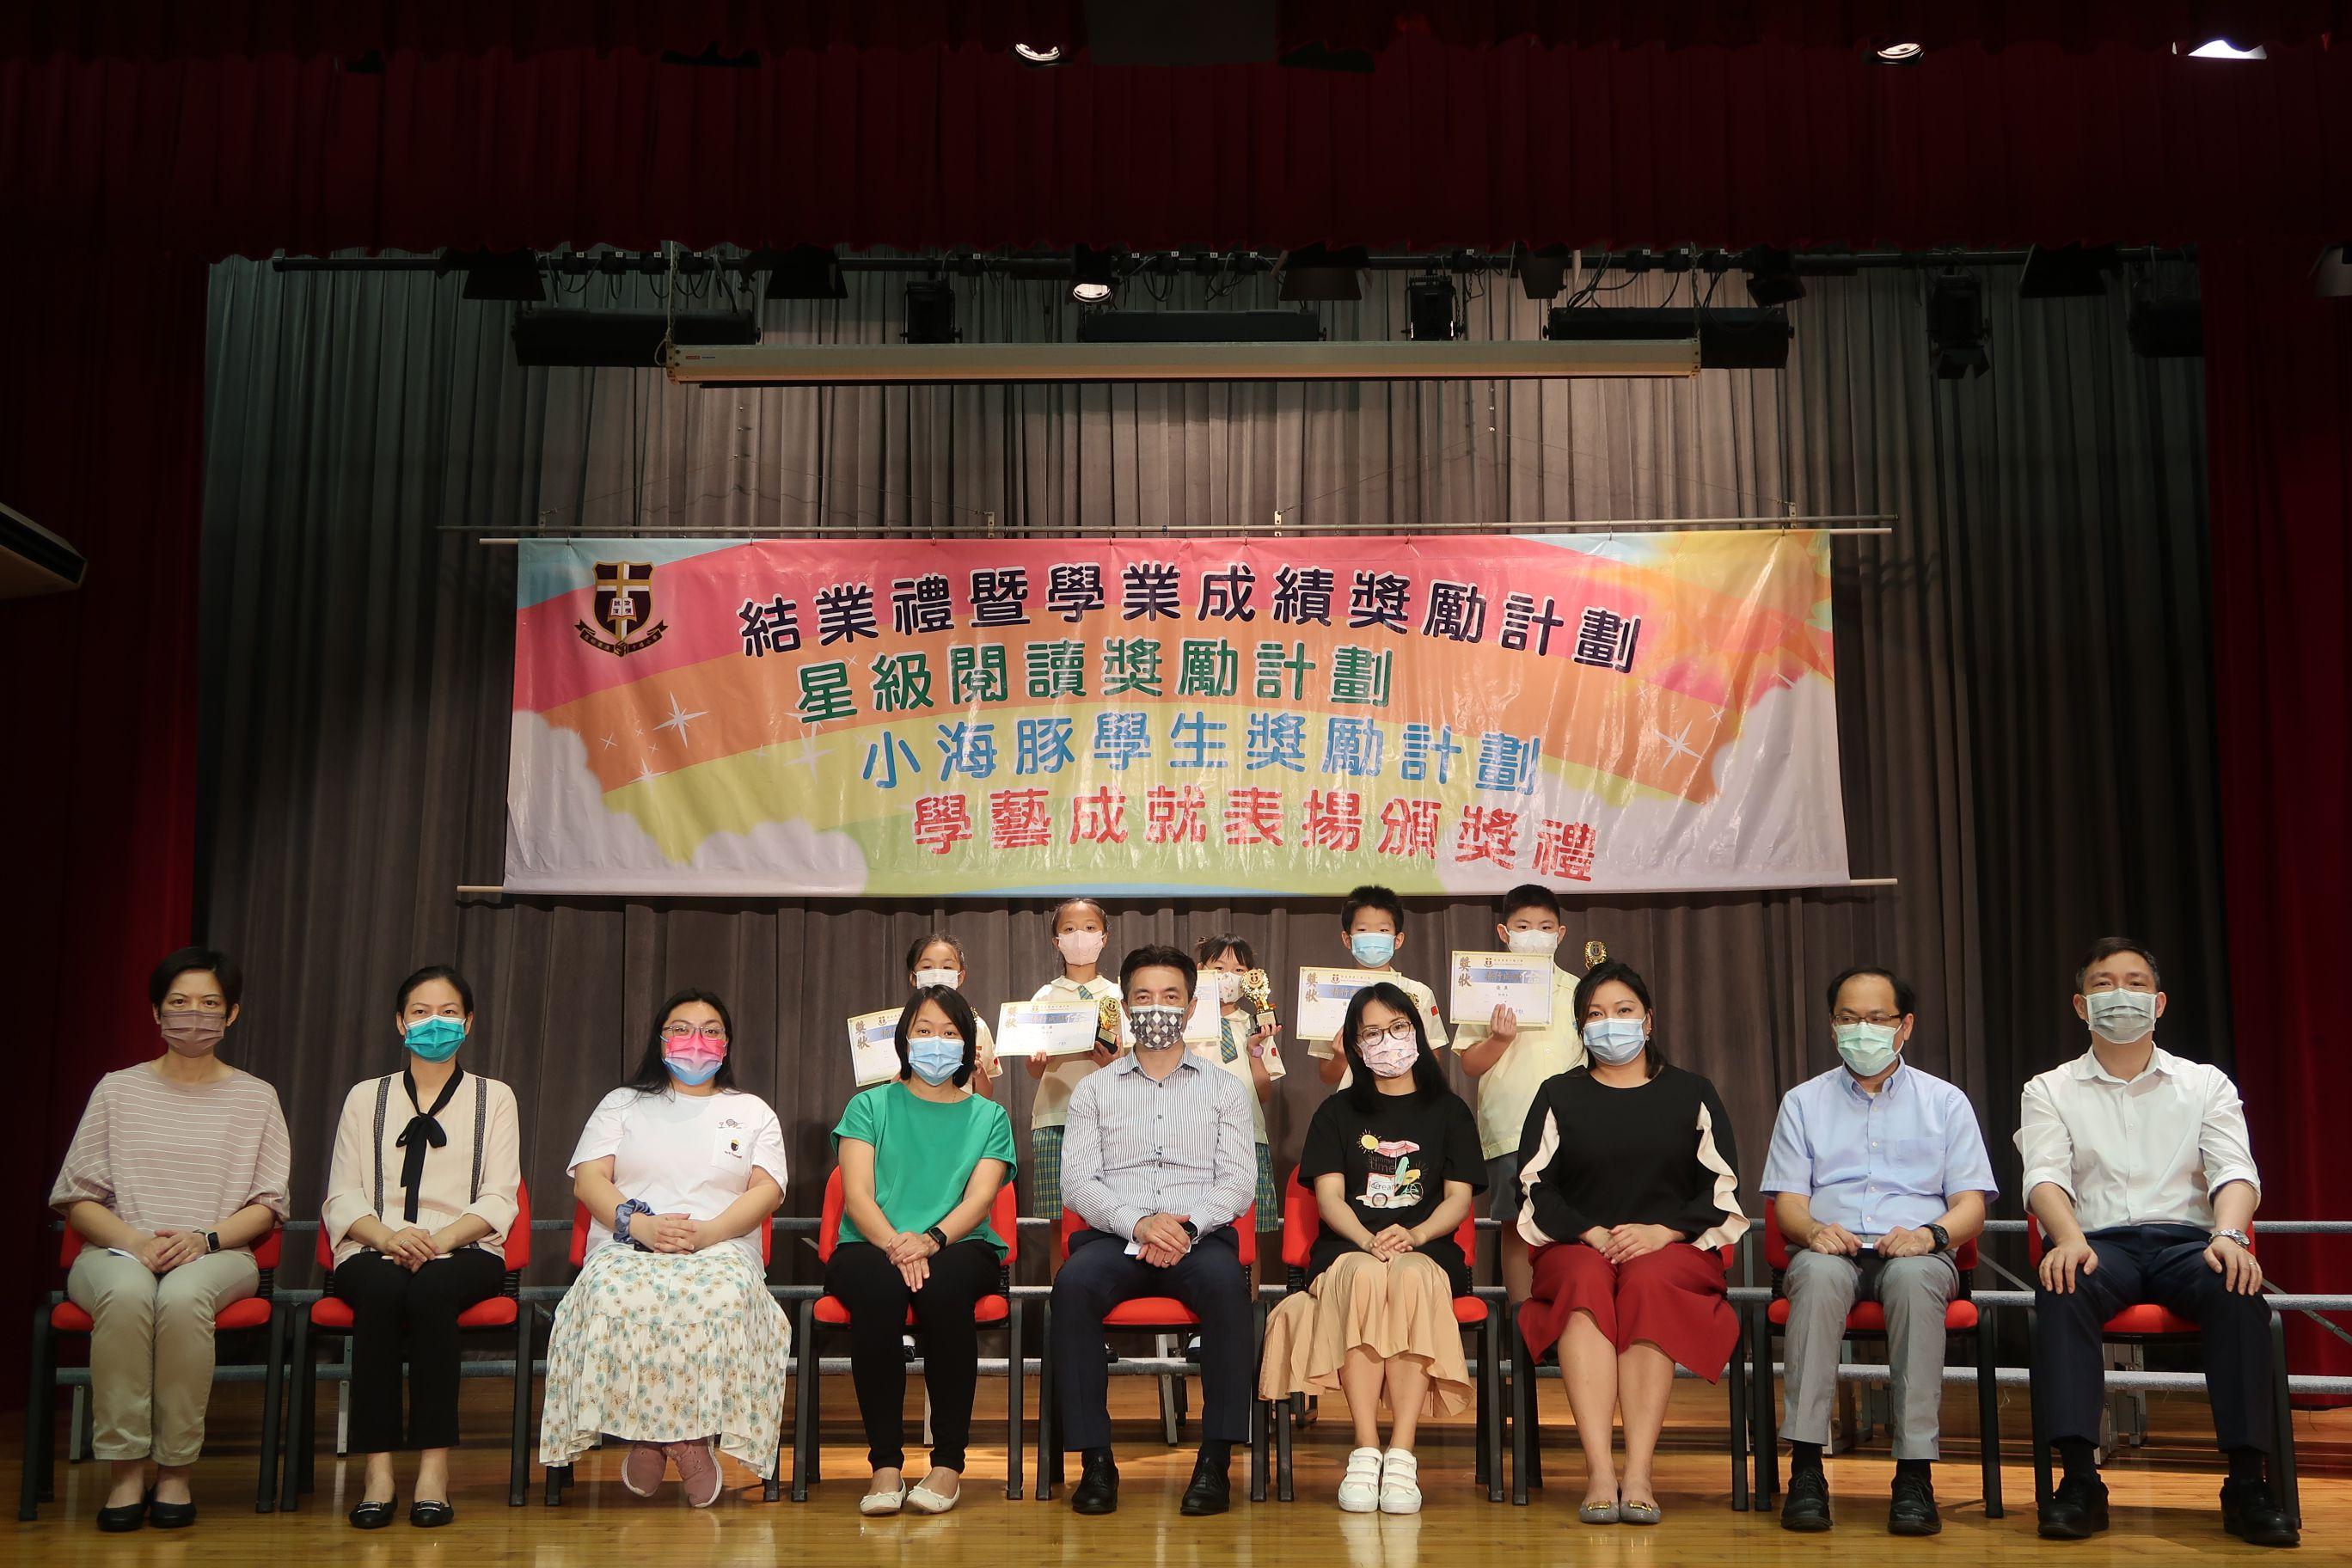 https://syh.edu.hk/sites/default/files/img_5484.jpg